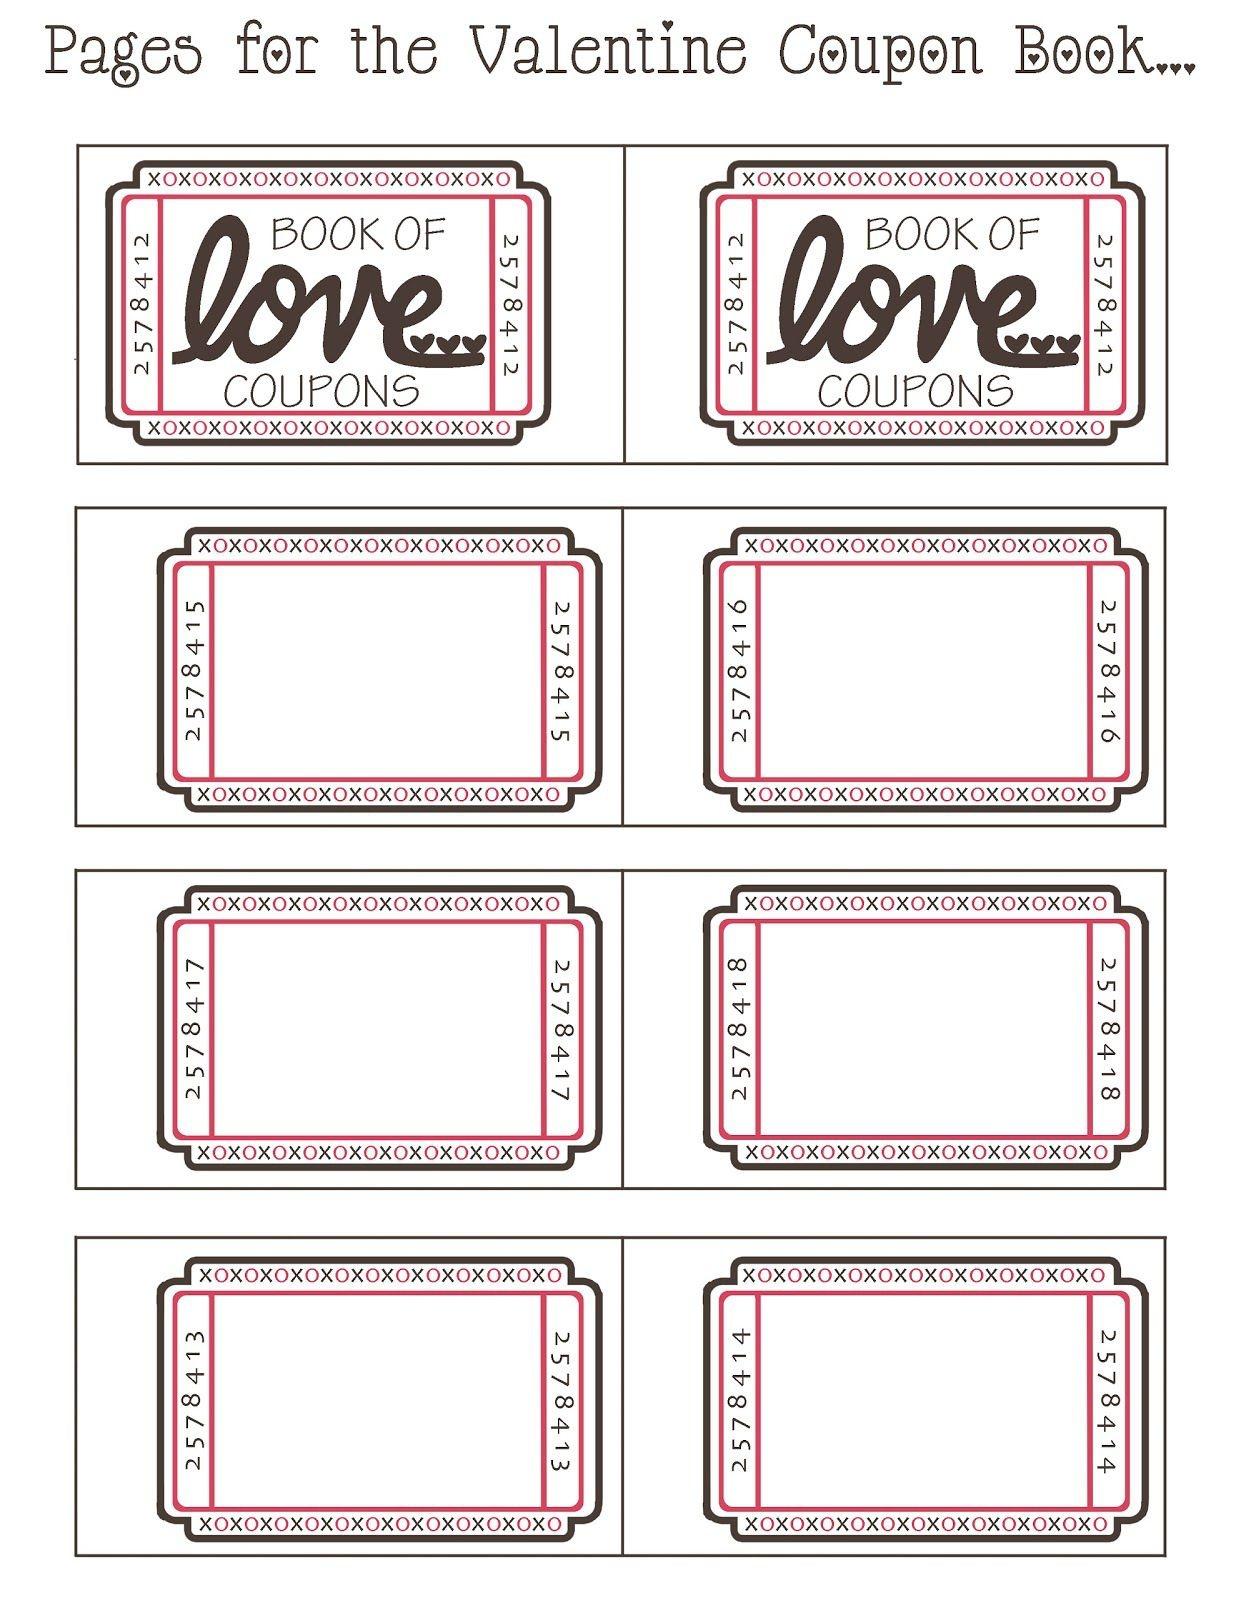 Coupon Book Ideas For Husband. Blank Love Coupon Templates Printable - Free Printable Coupons For Husband